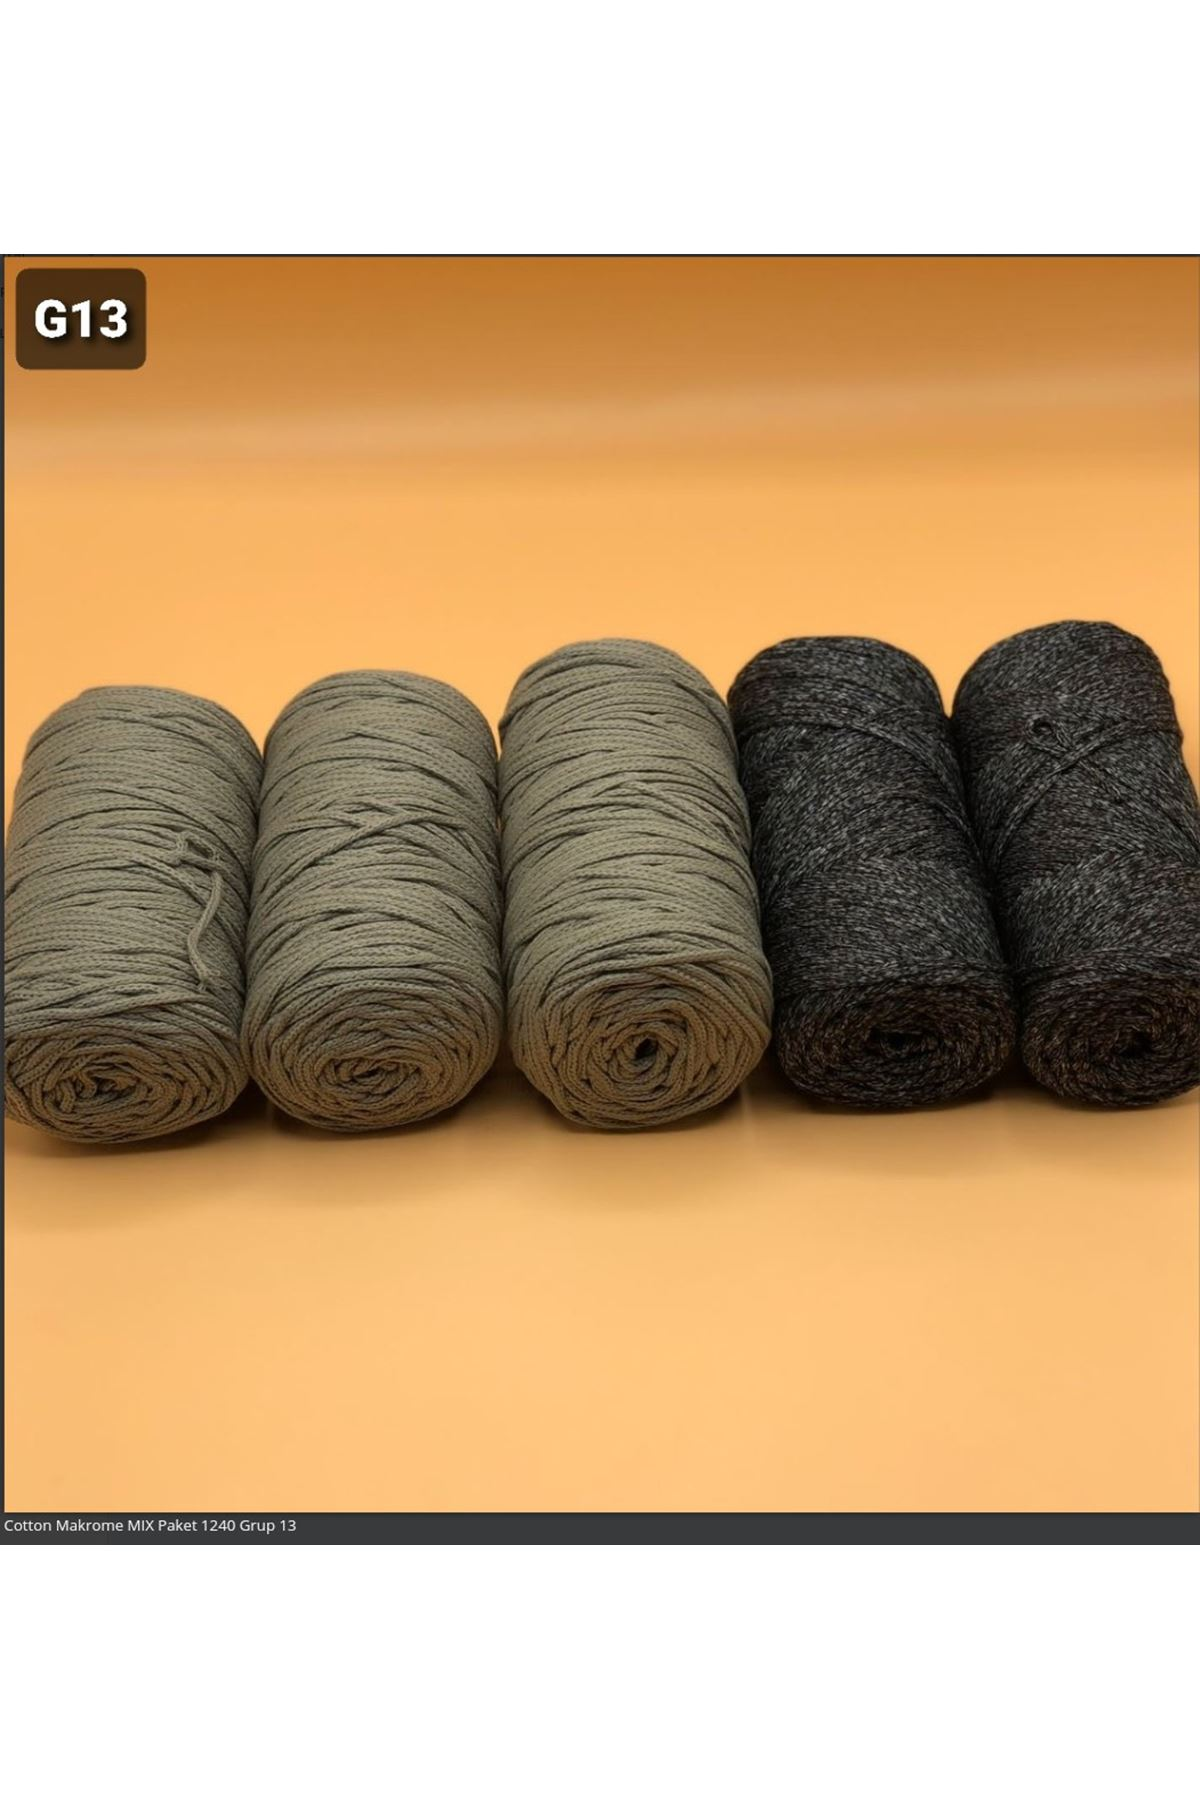 Cotton Makrome MIX Paket 1240 Grup 13